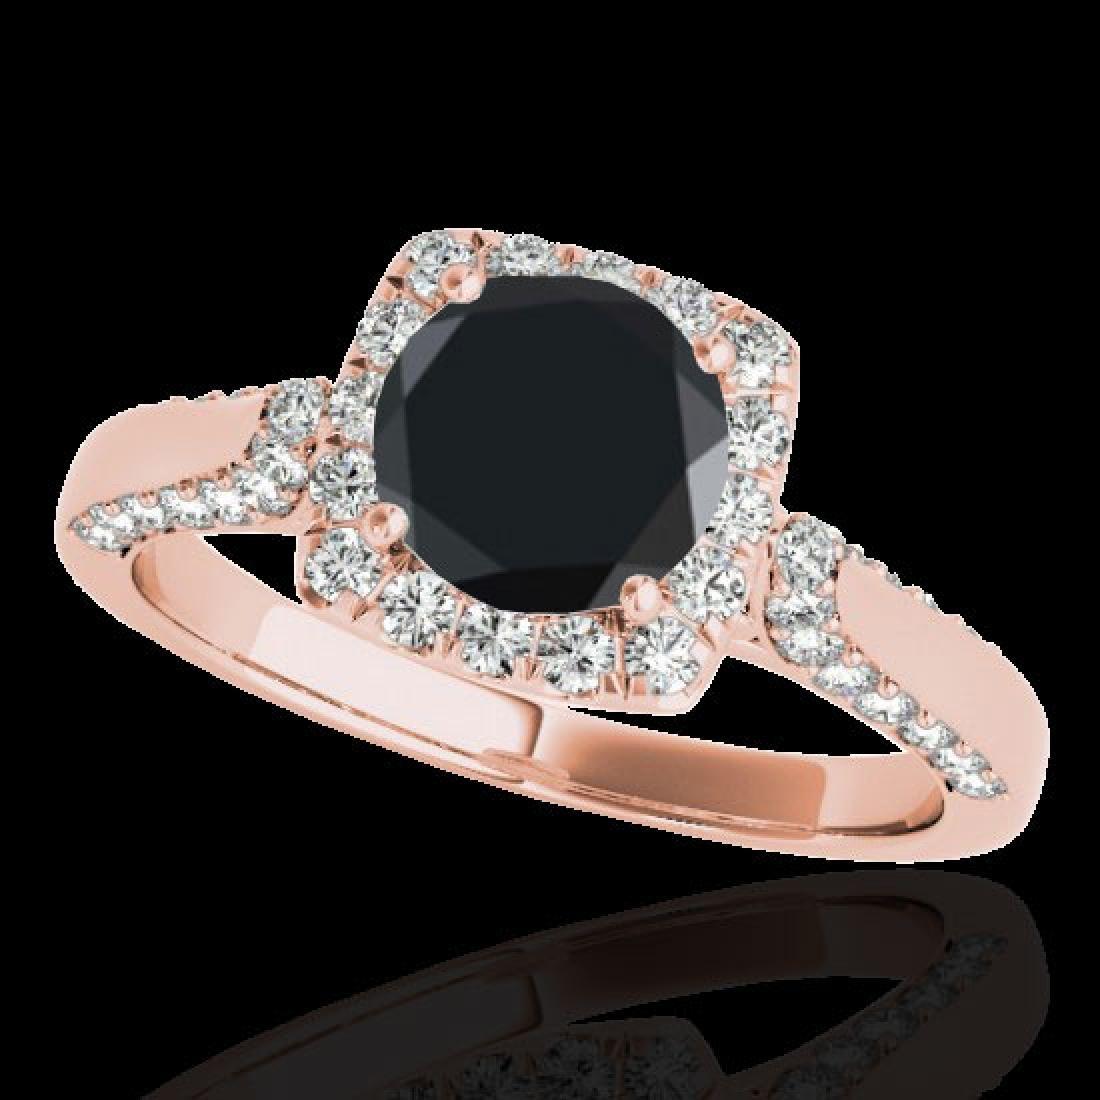 1.7 CTW Certified VS Black Diamond Solitaire Halo Ring